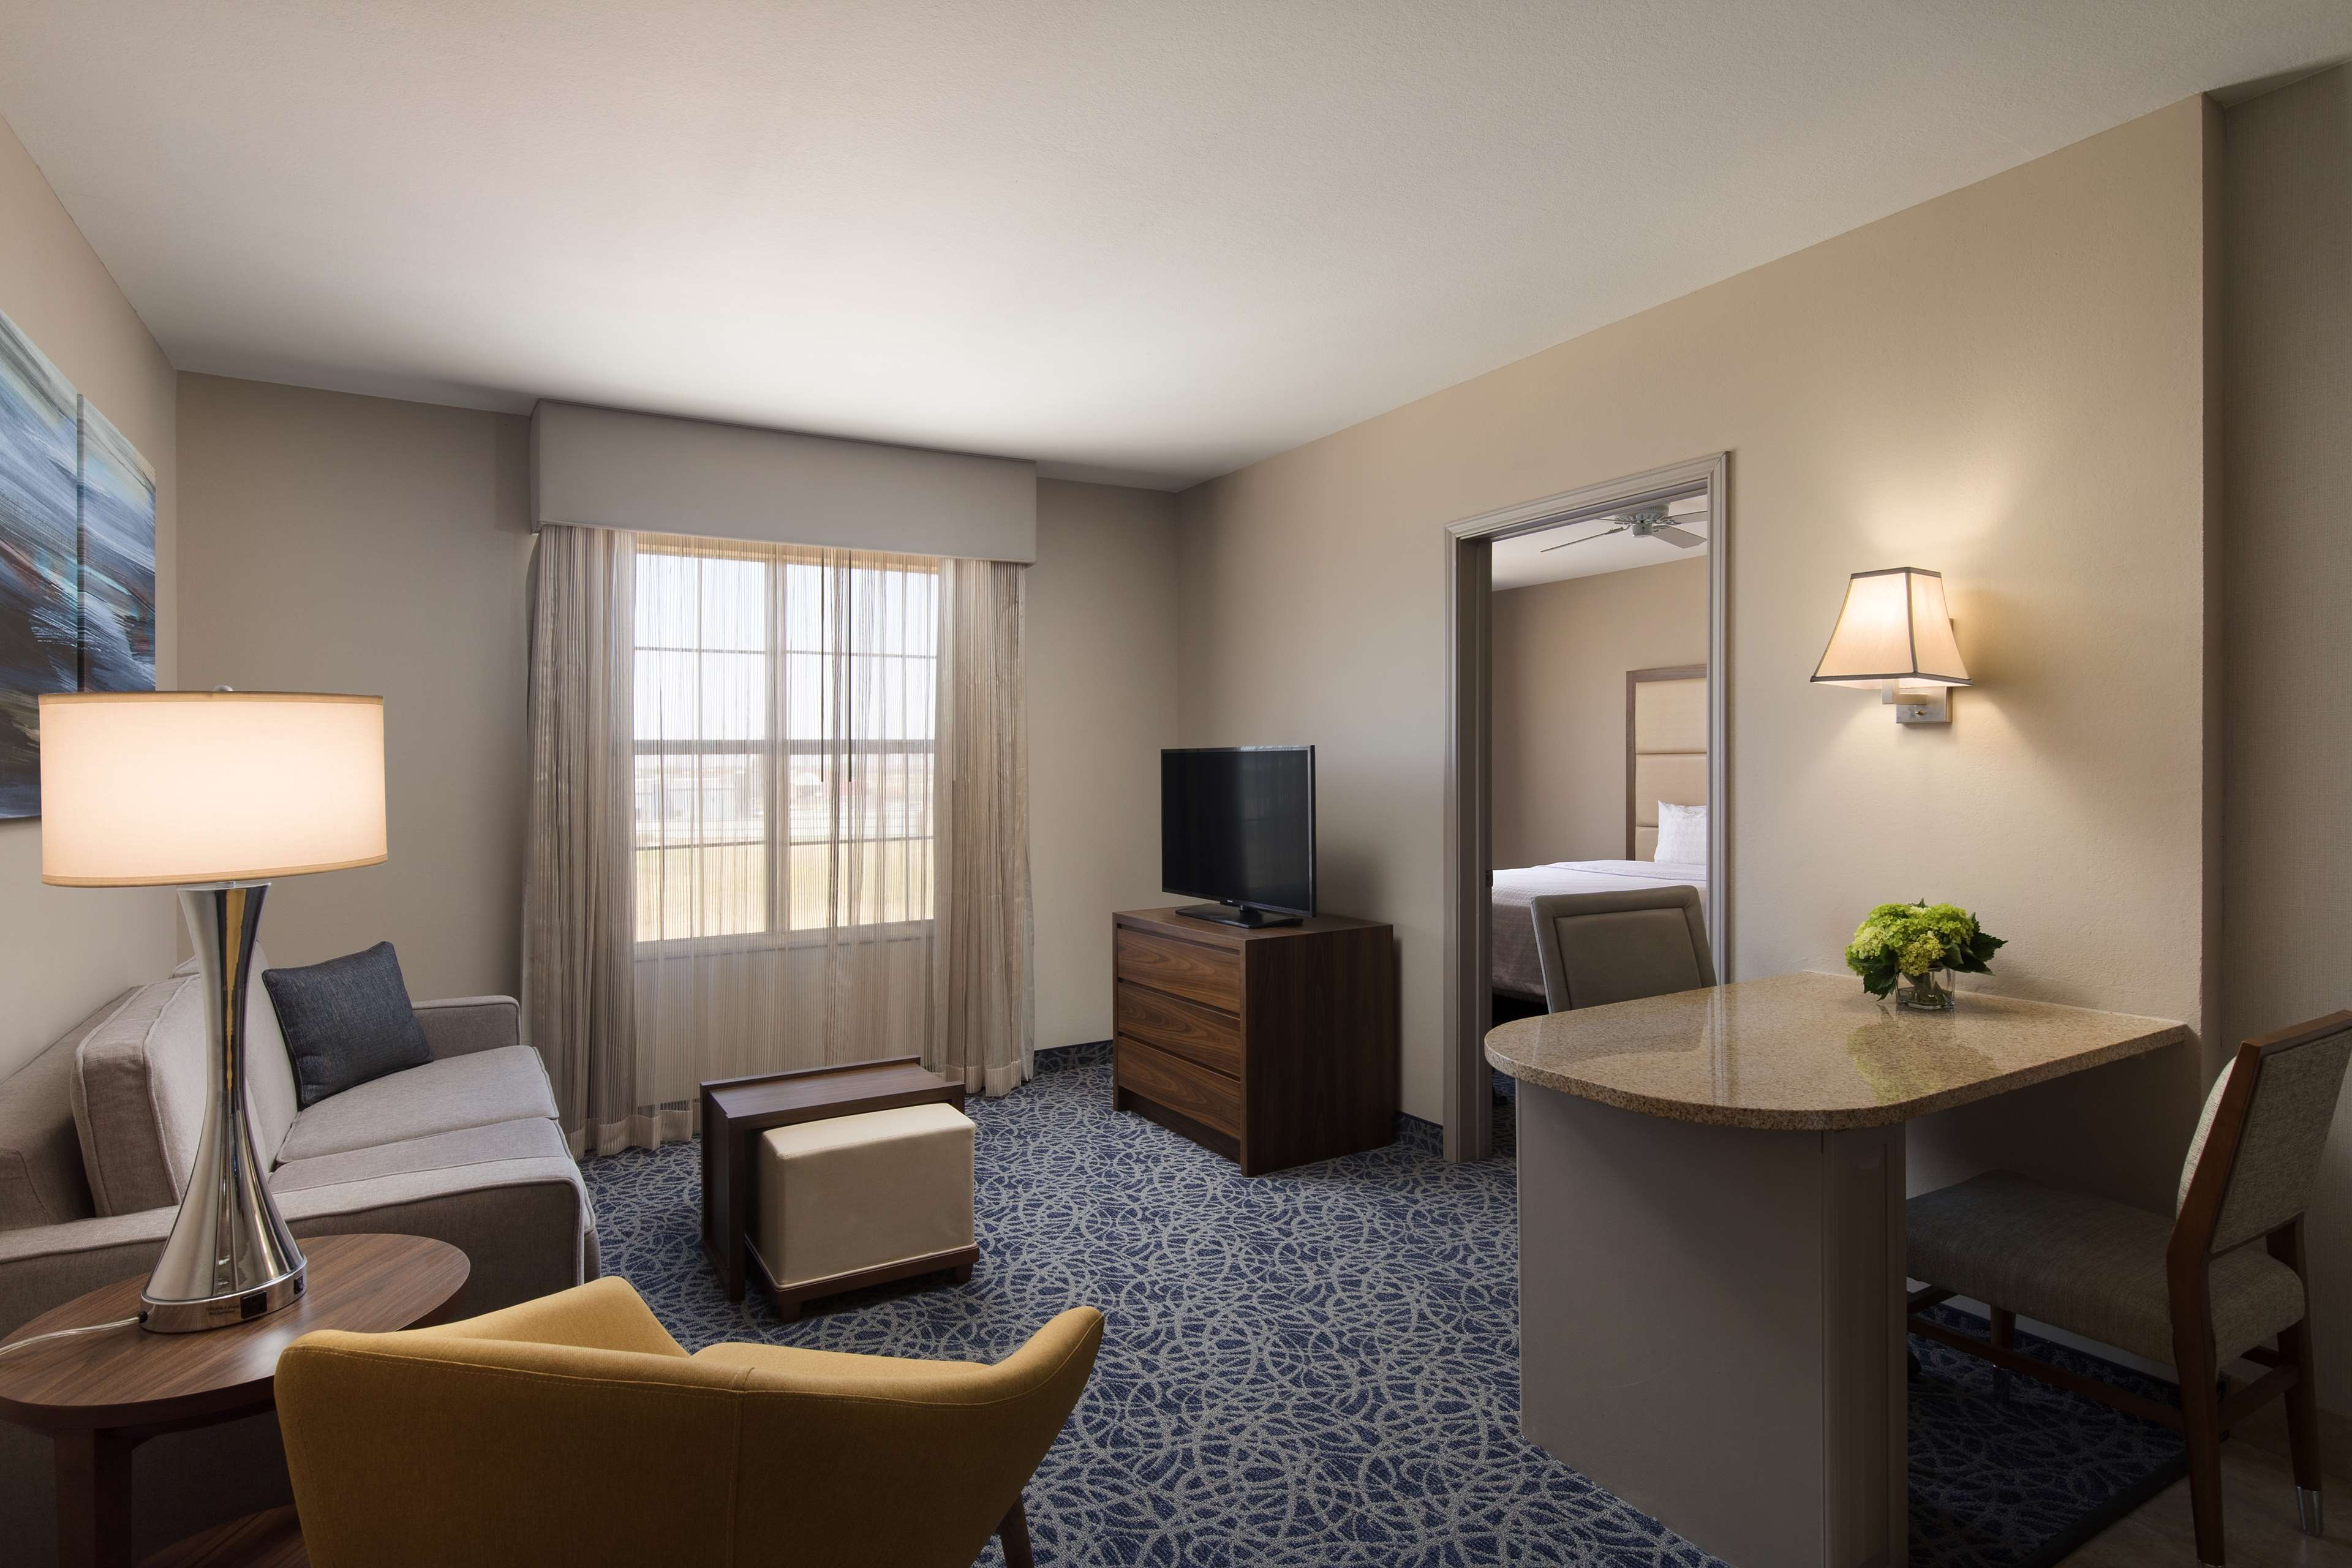 Homewood Suites by Hilton Lubbock image 15